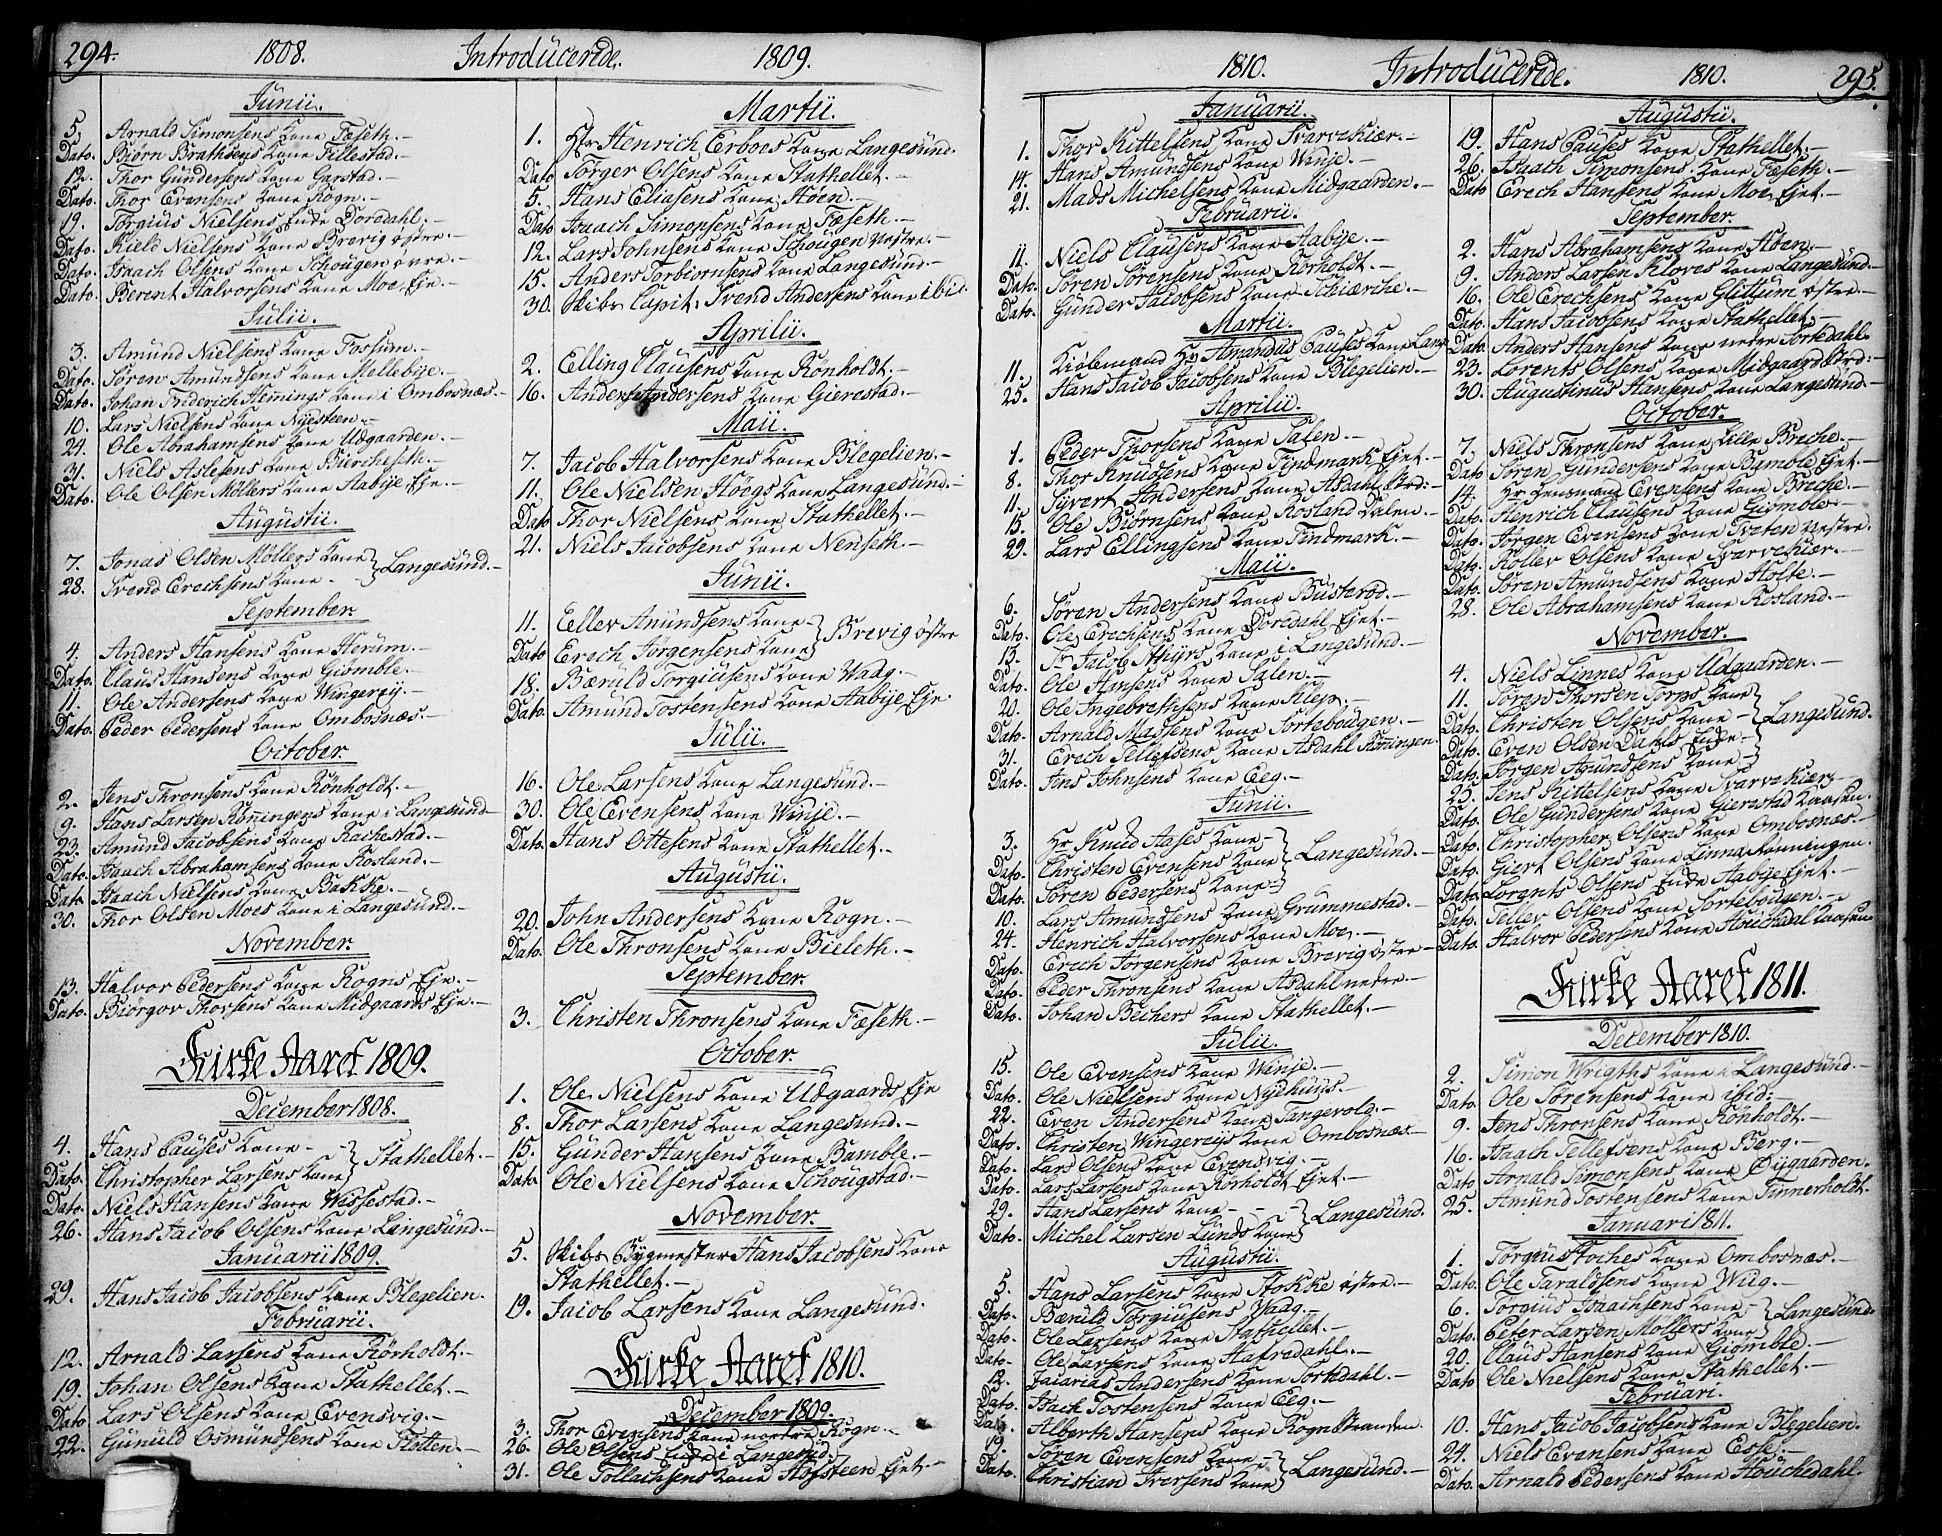 SAKO, Bamble kirkebøker, F/Fa/L0002: Ministerialbok nr. I 2, 1775-1814, s. 294-295